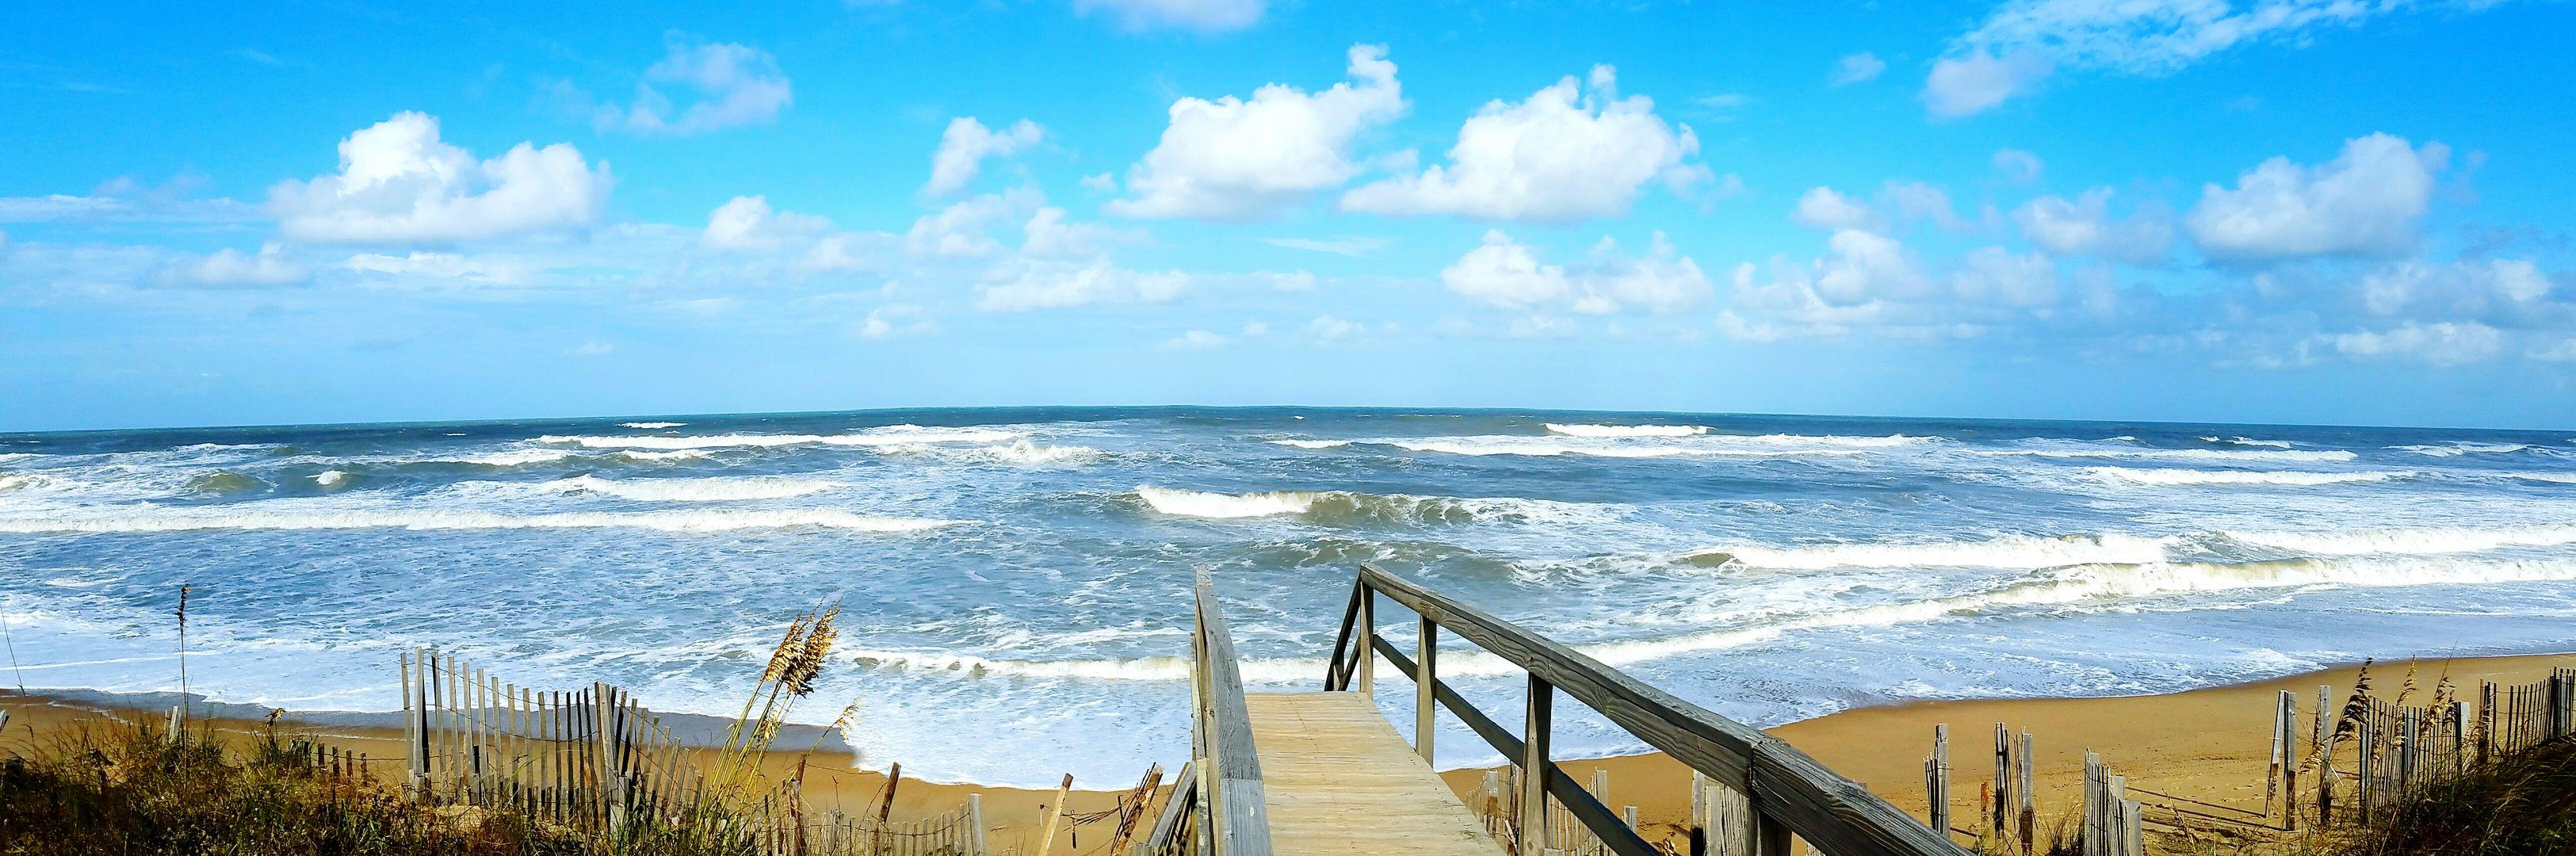 Beach Ocean Panaroma Southern Shores OBX